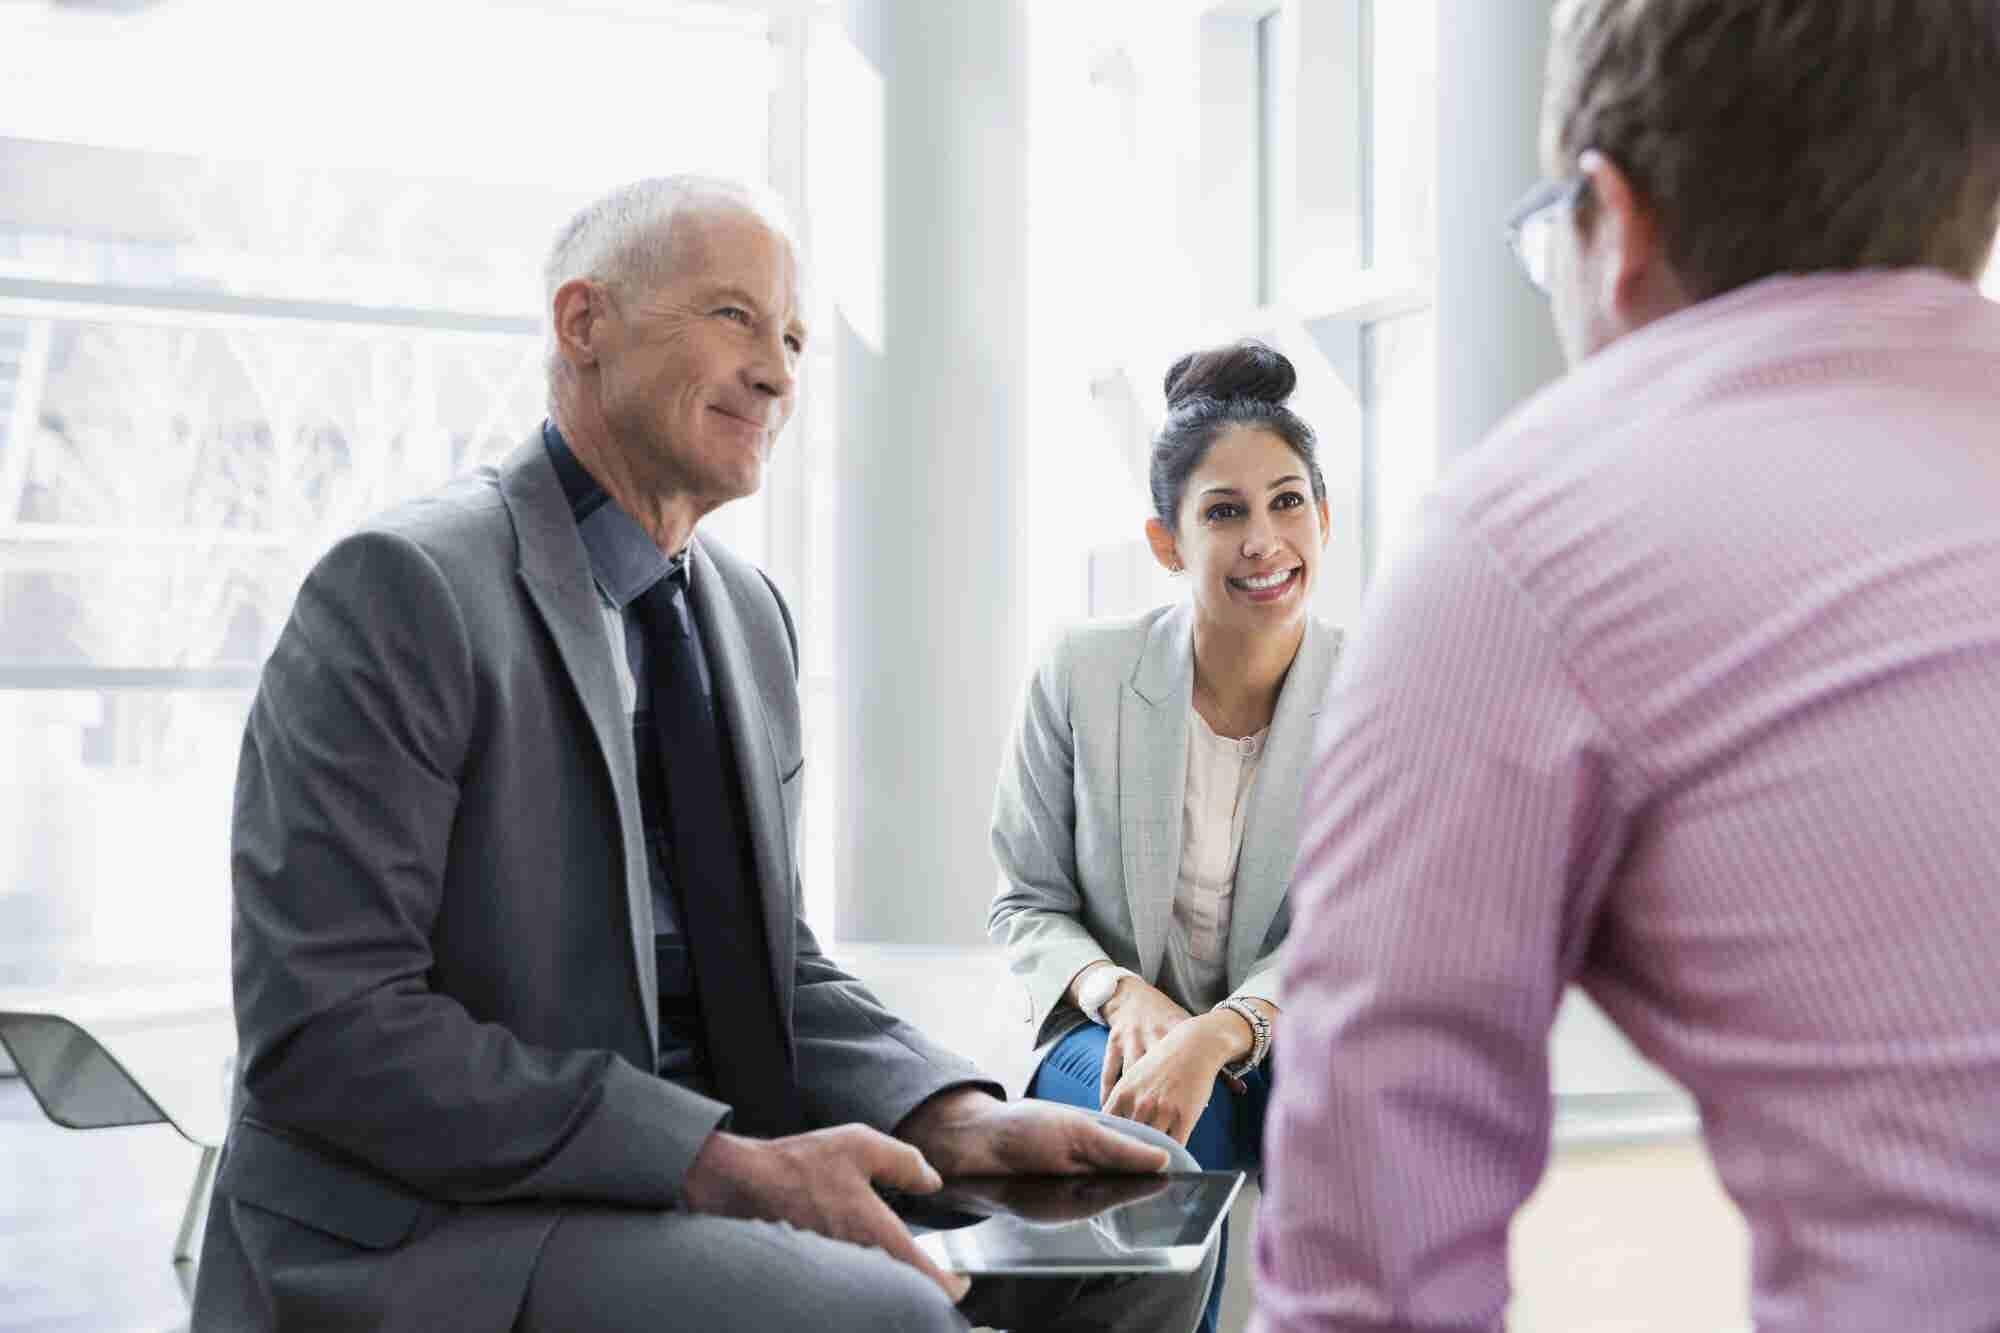 5 Questions Billionaires Ask Prospective Employees